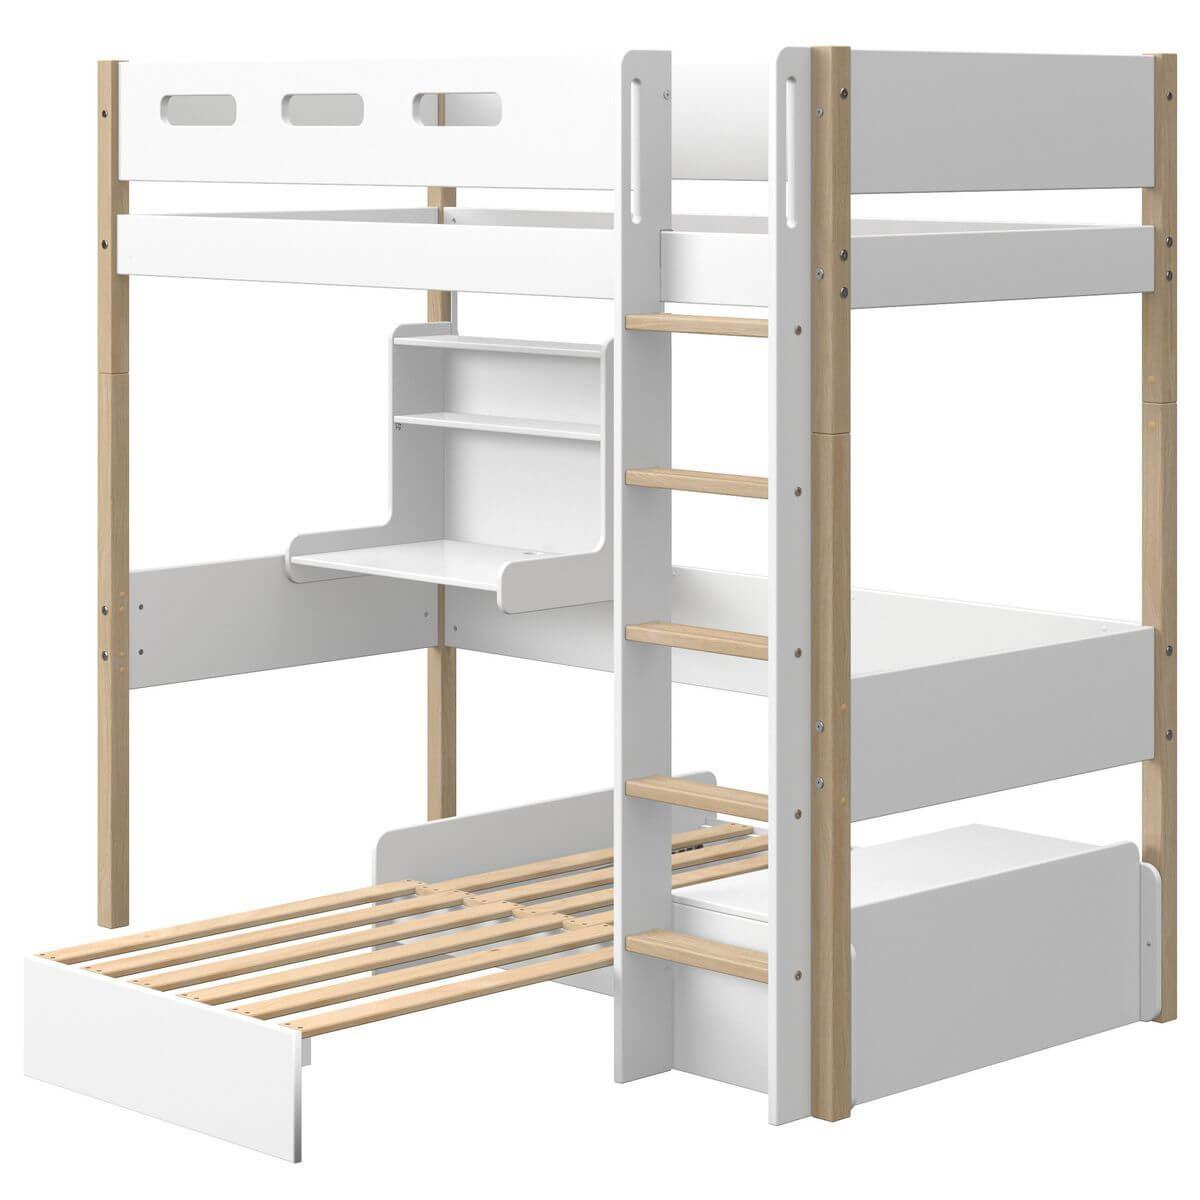 Lit mezzanine 90x190cm bureau Click-On module de couchage casa NOR Flexa chêne-blanc